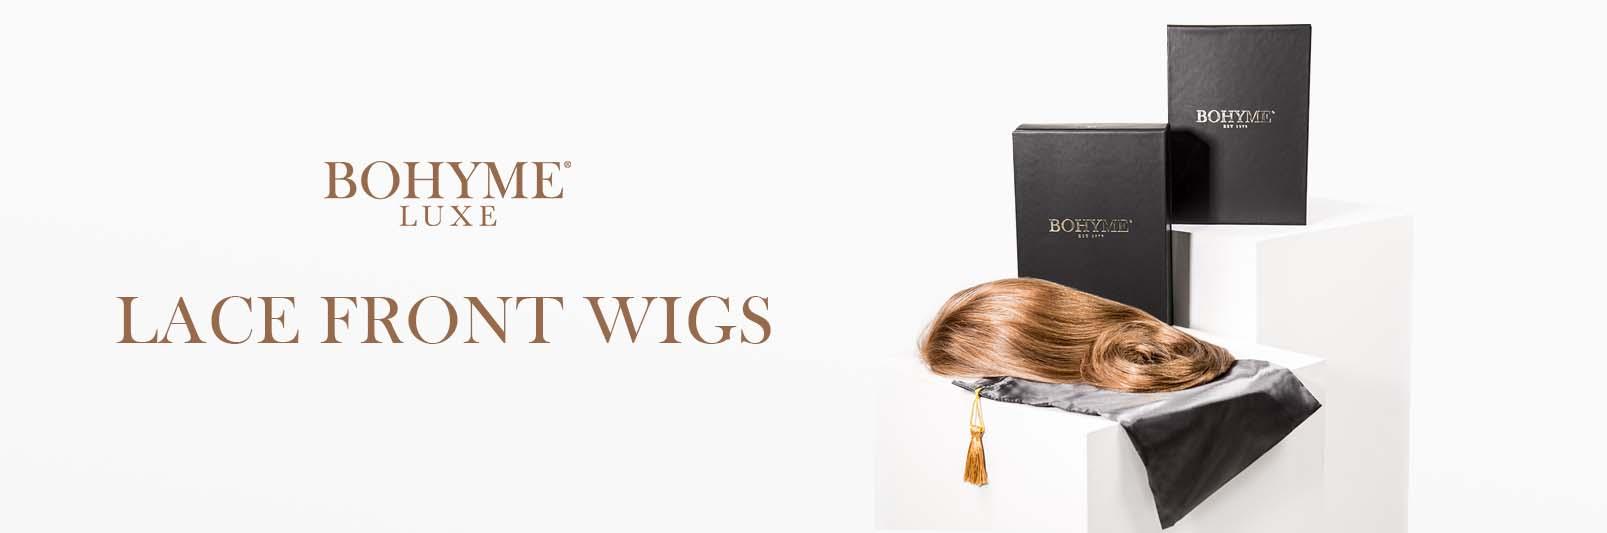 wigs banner2.jpg